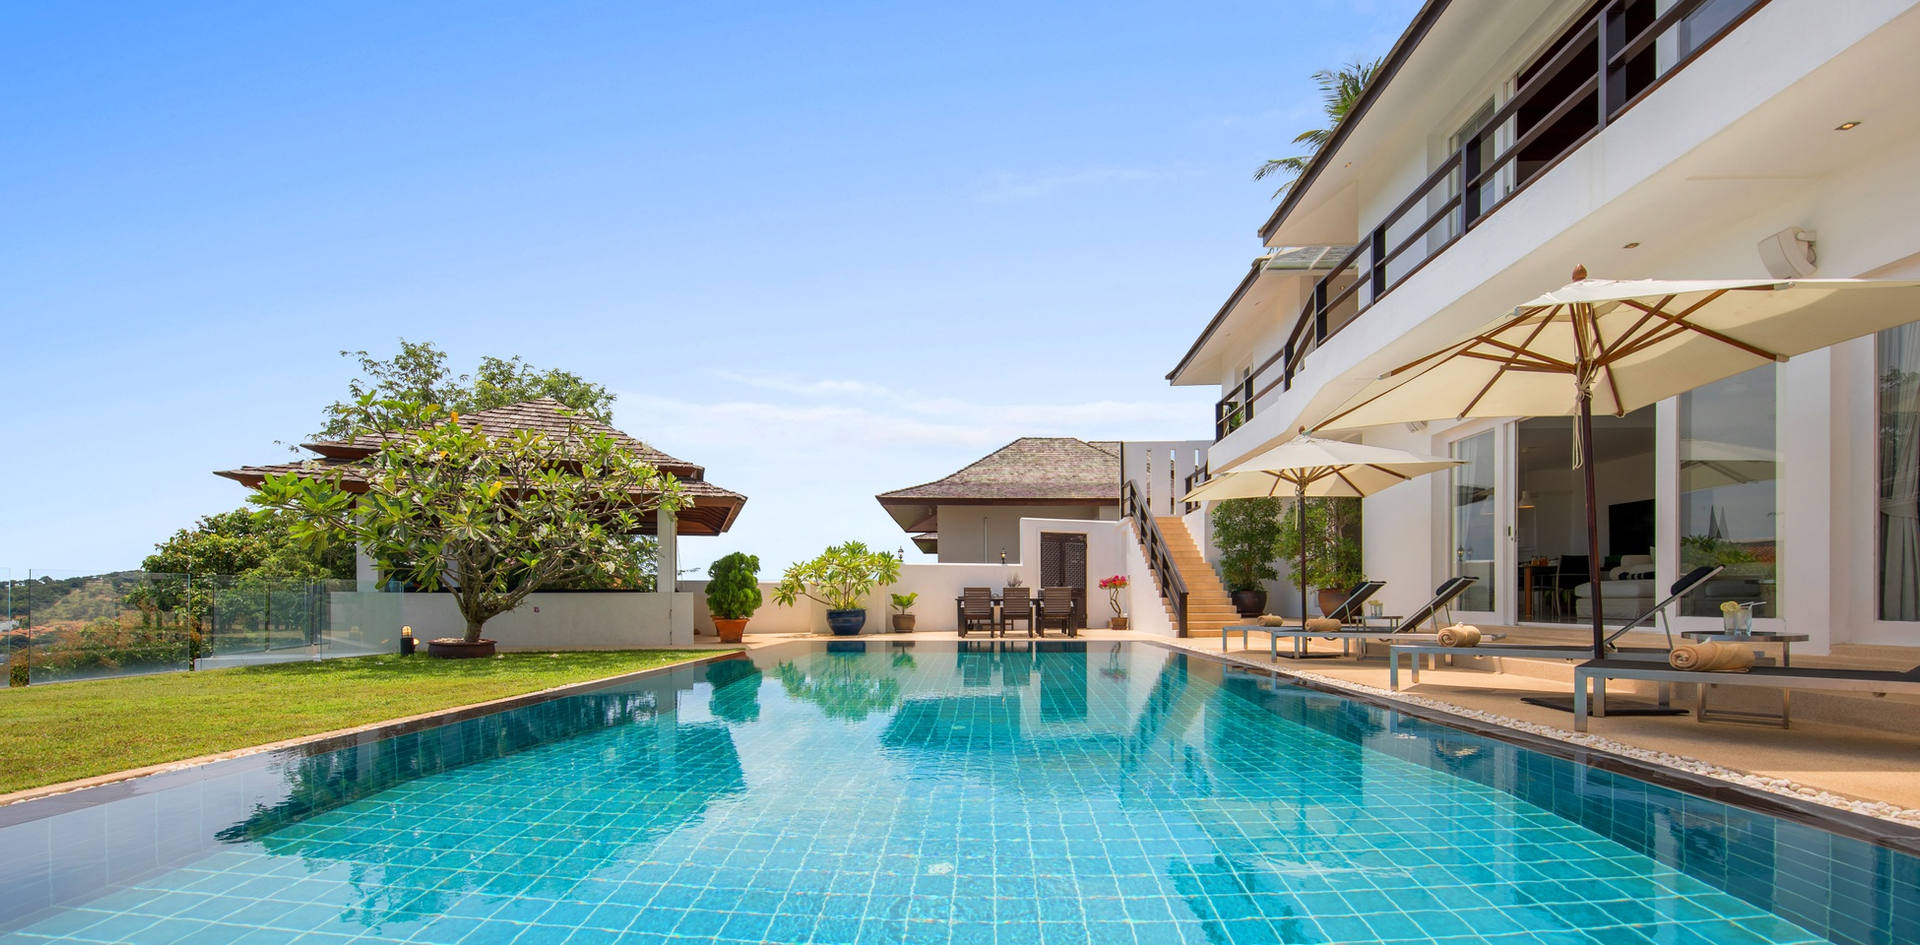 Villa Mullion Cove Pool1 - Villa Mullion C